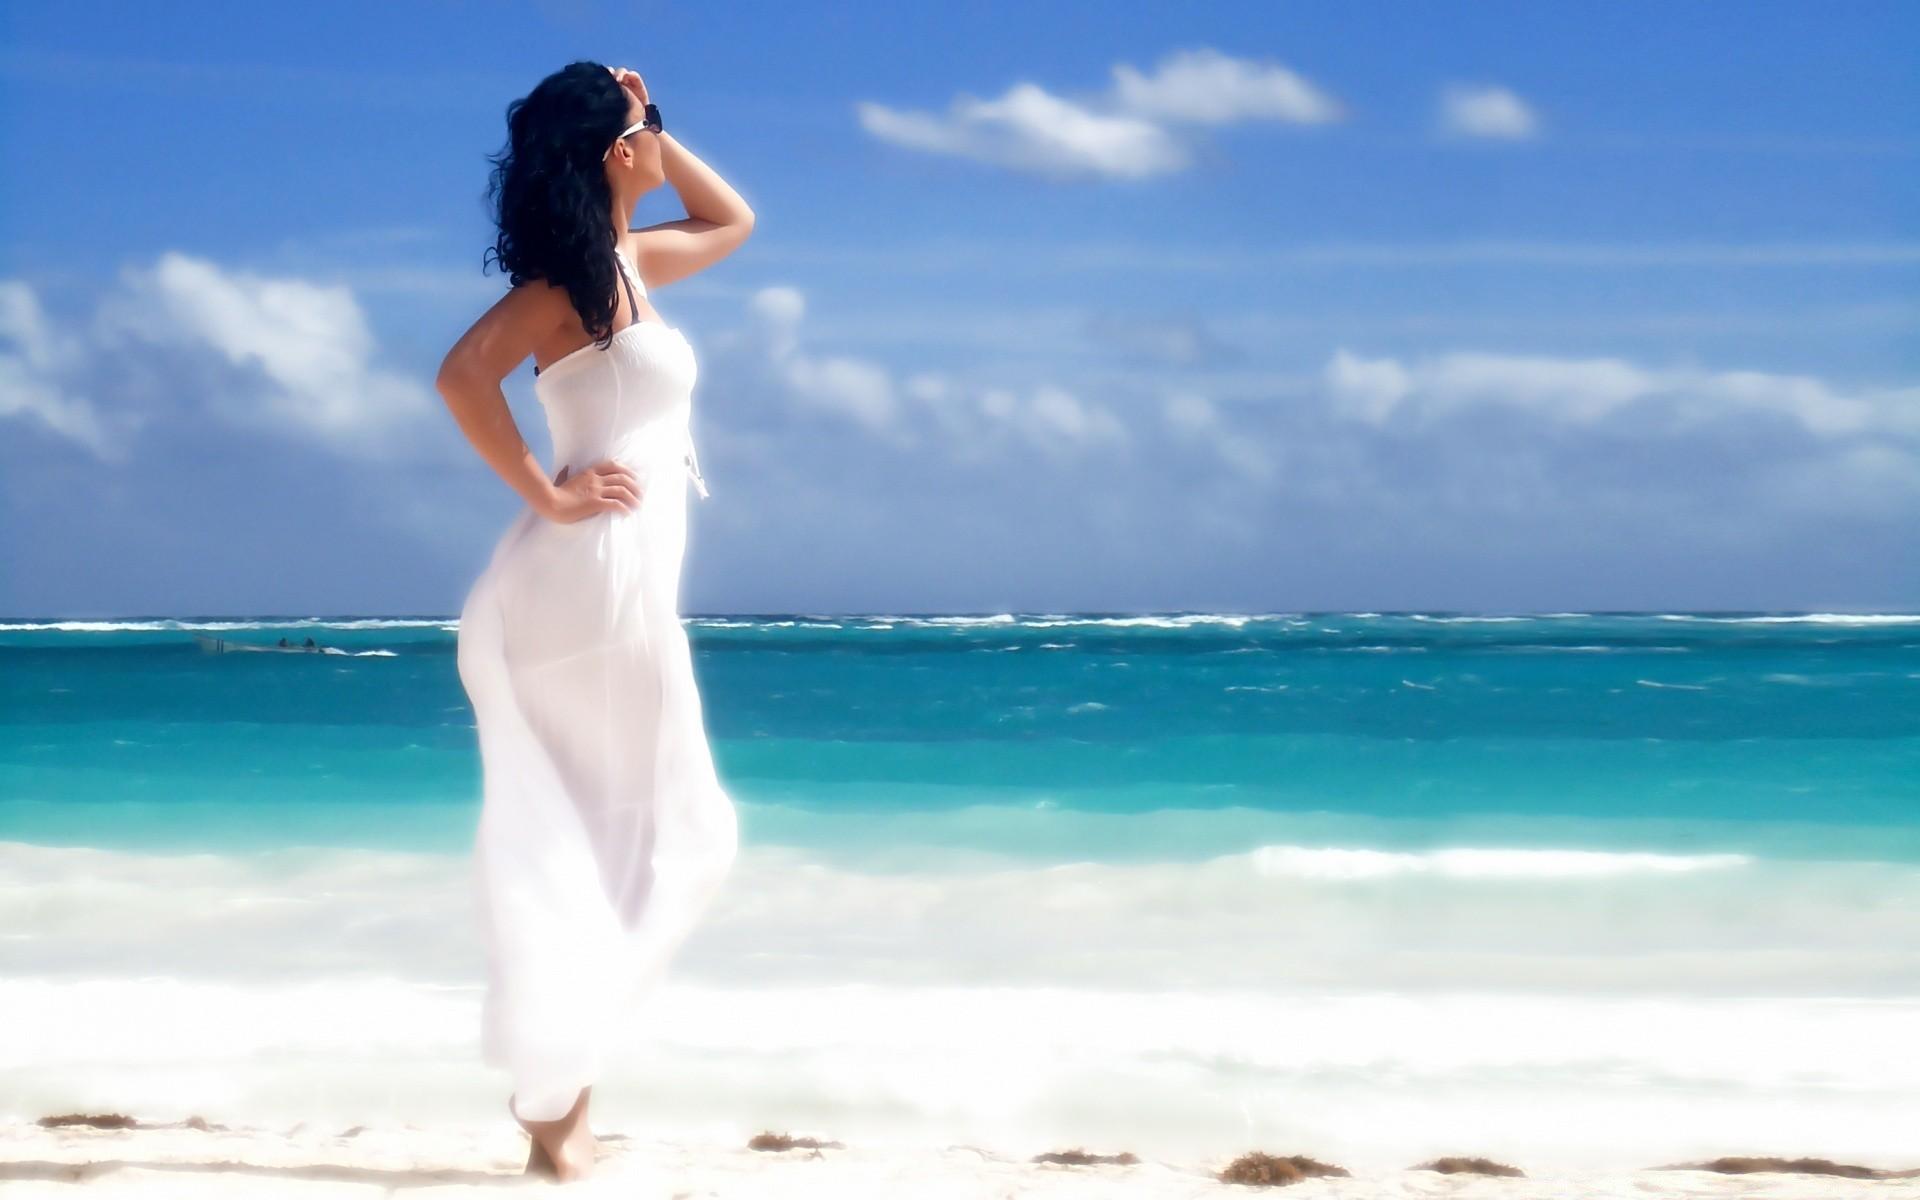 Фото девушек на фоне океана, Фото: Девушка на фоне океана 14 фотография